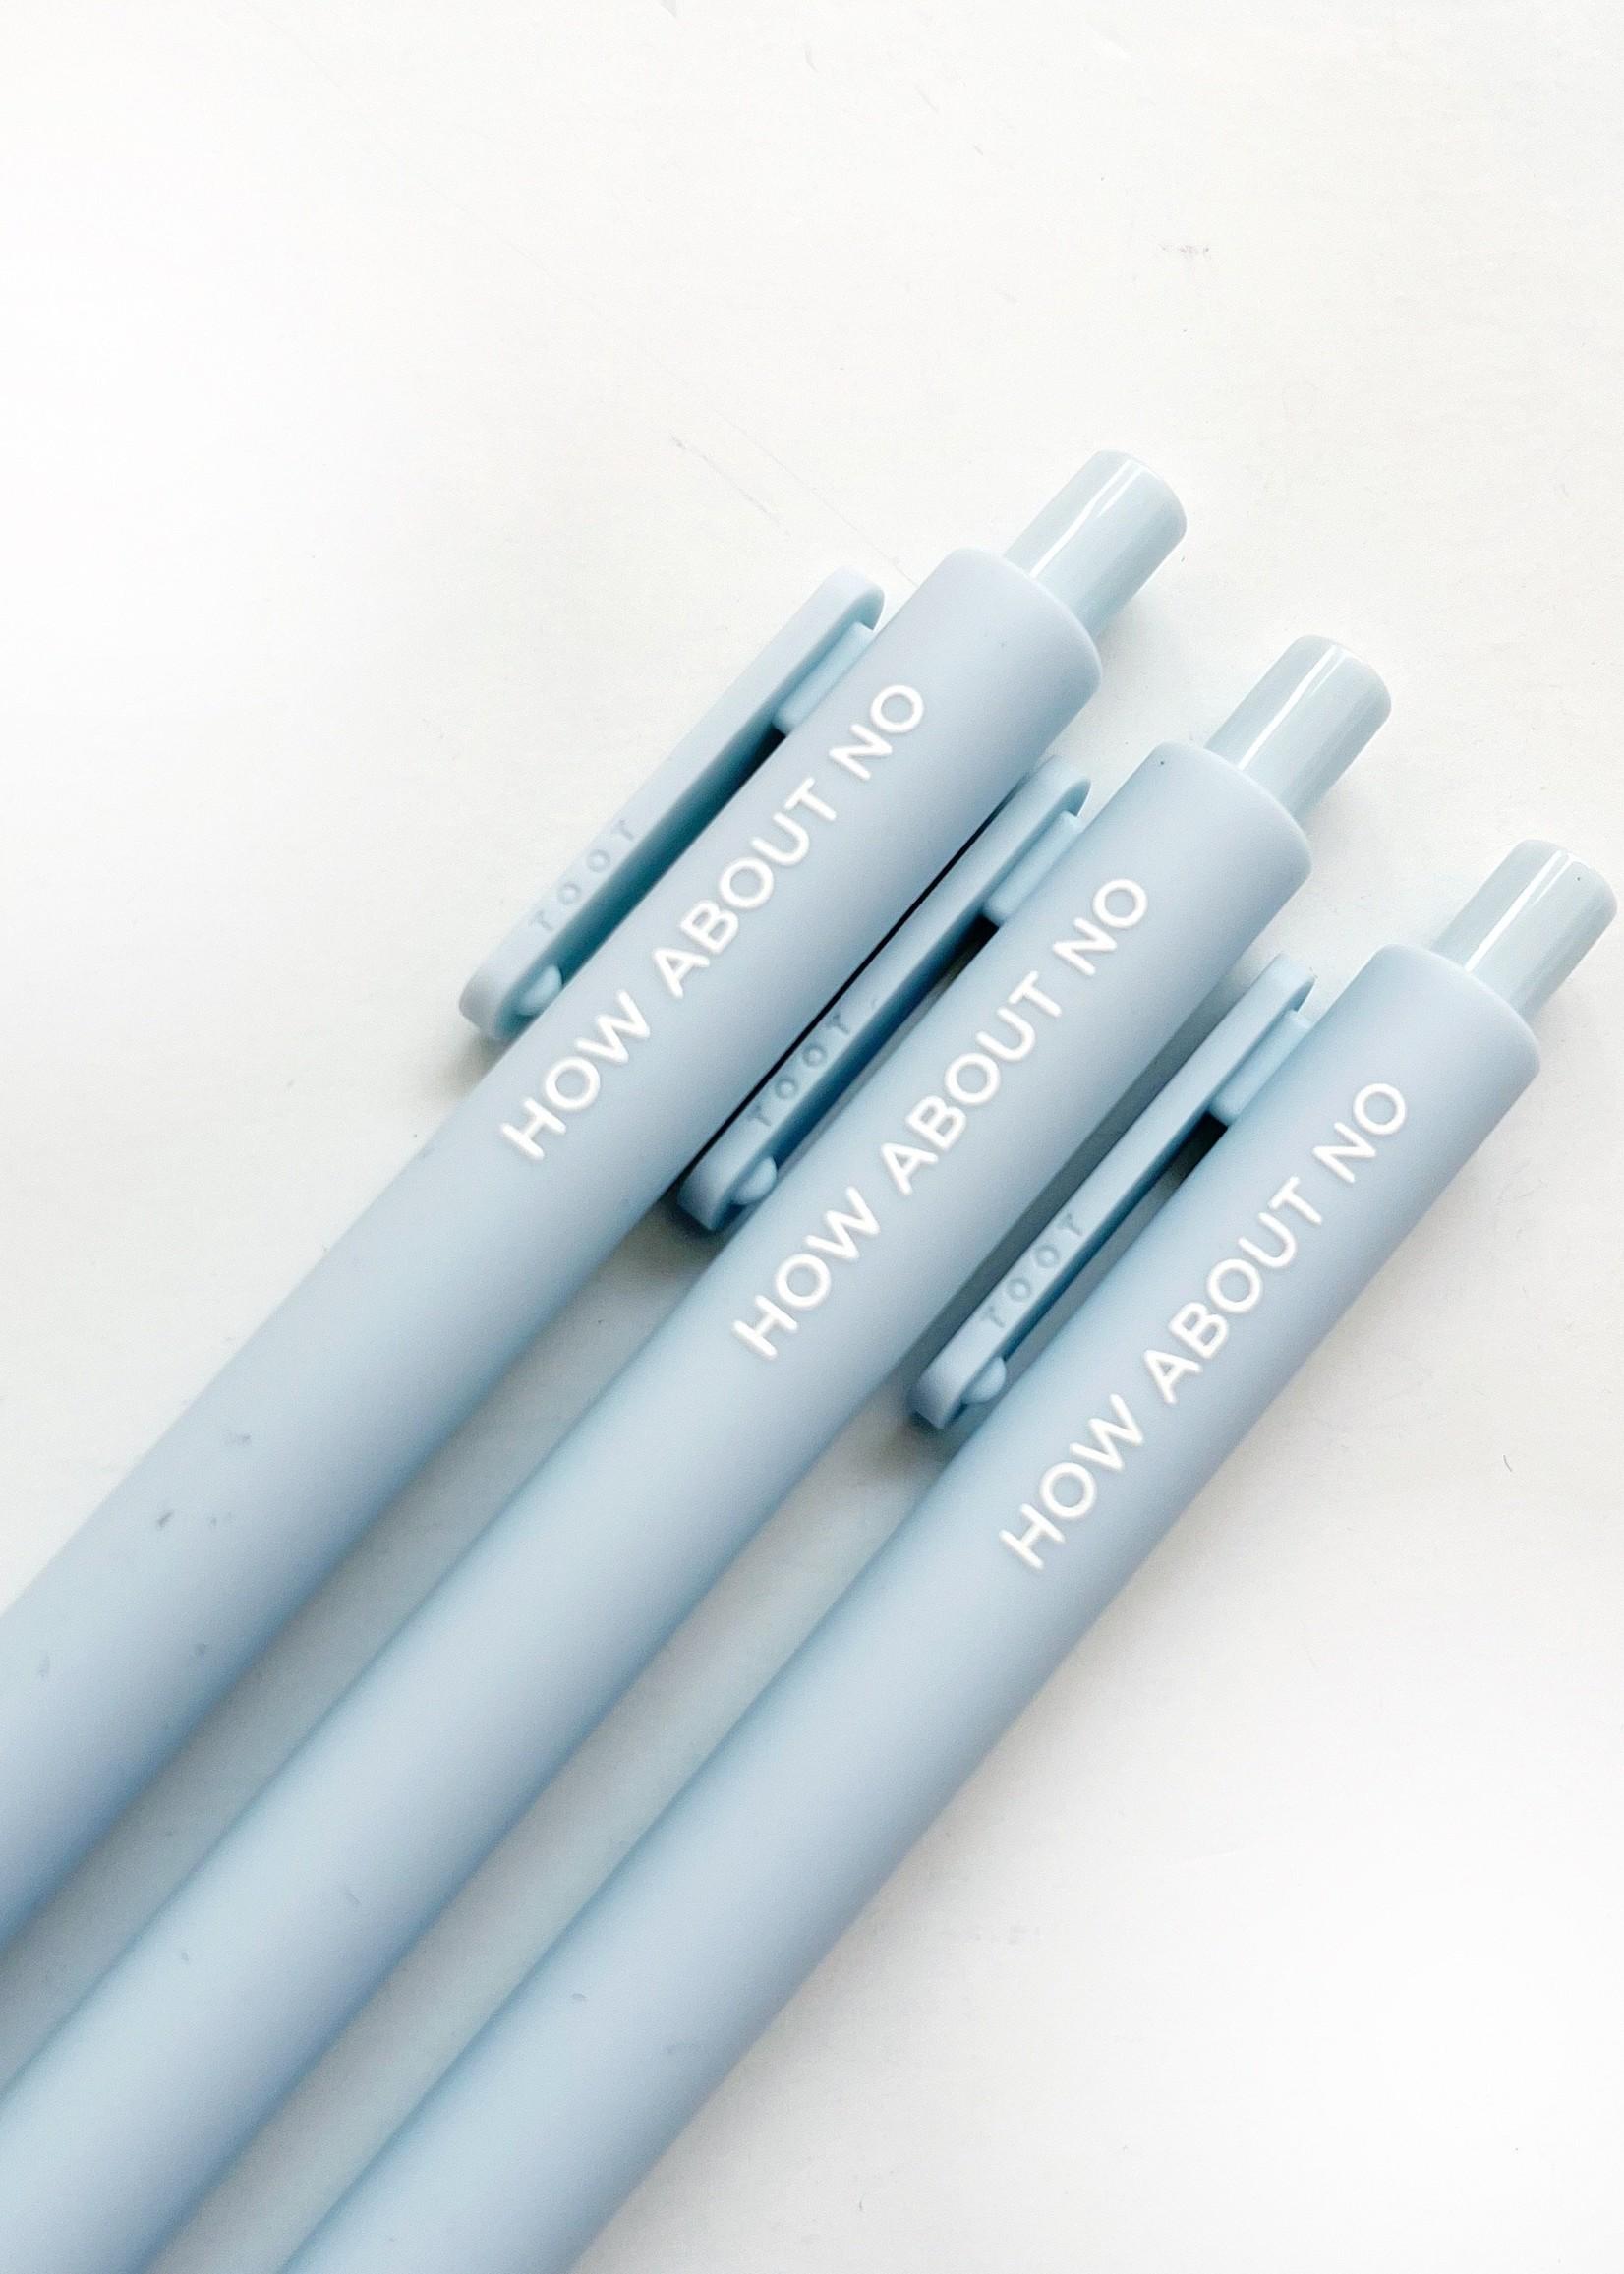 Calliope Pencil Factory Cheeky Pens